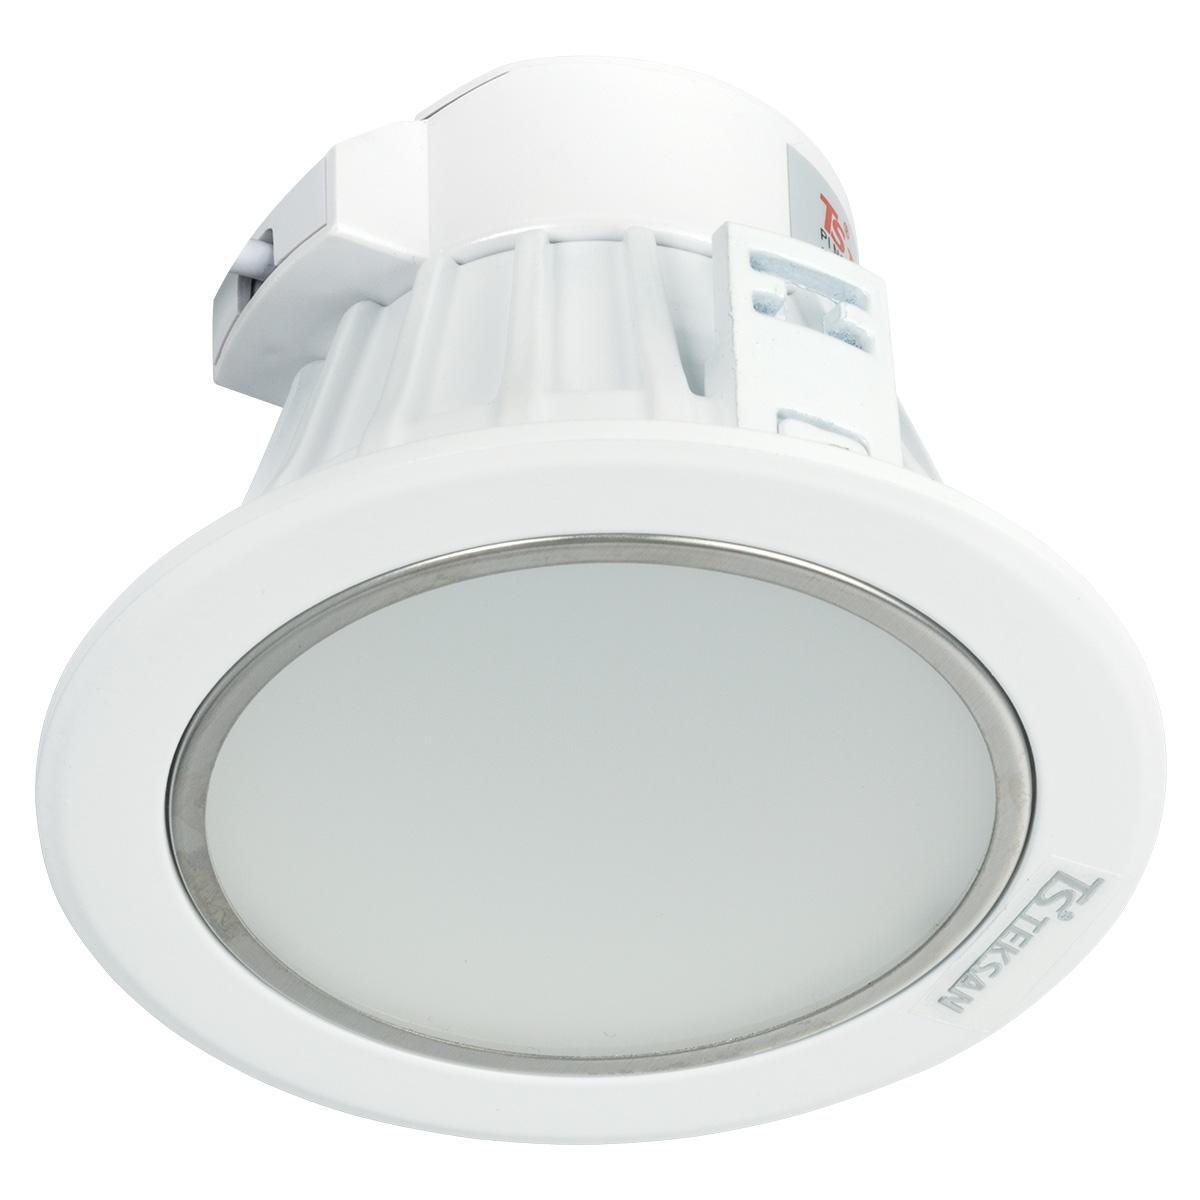 Sv-k DOWNLIGHT LED ARES 6W 5000K WHITE (TS)60sh